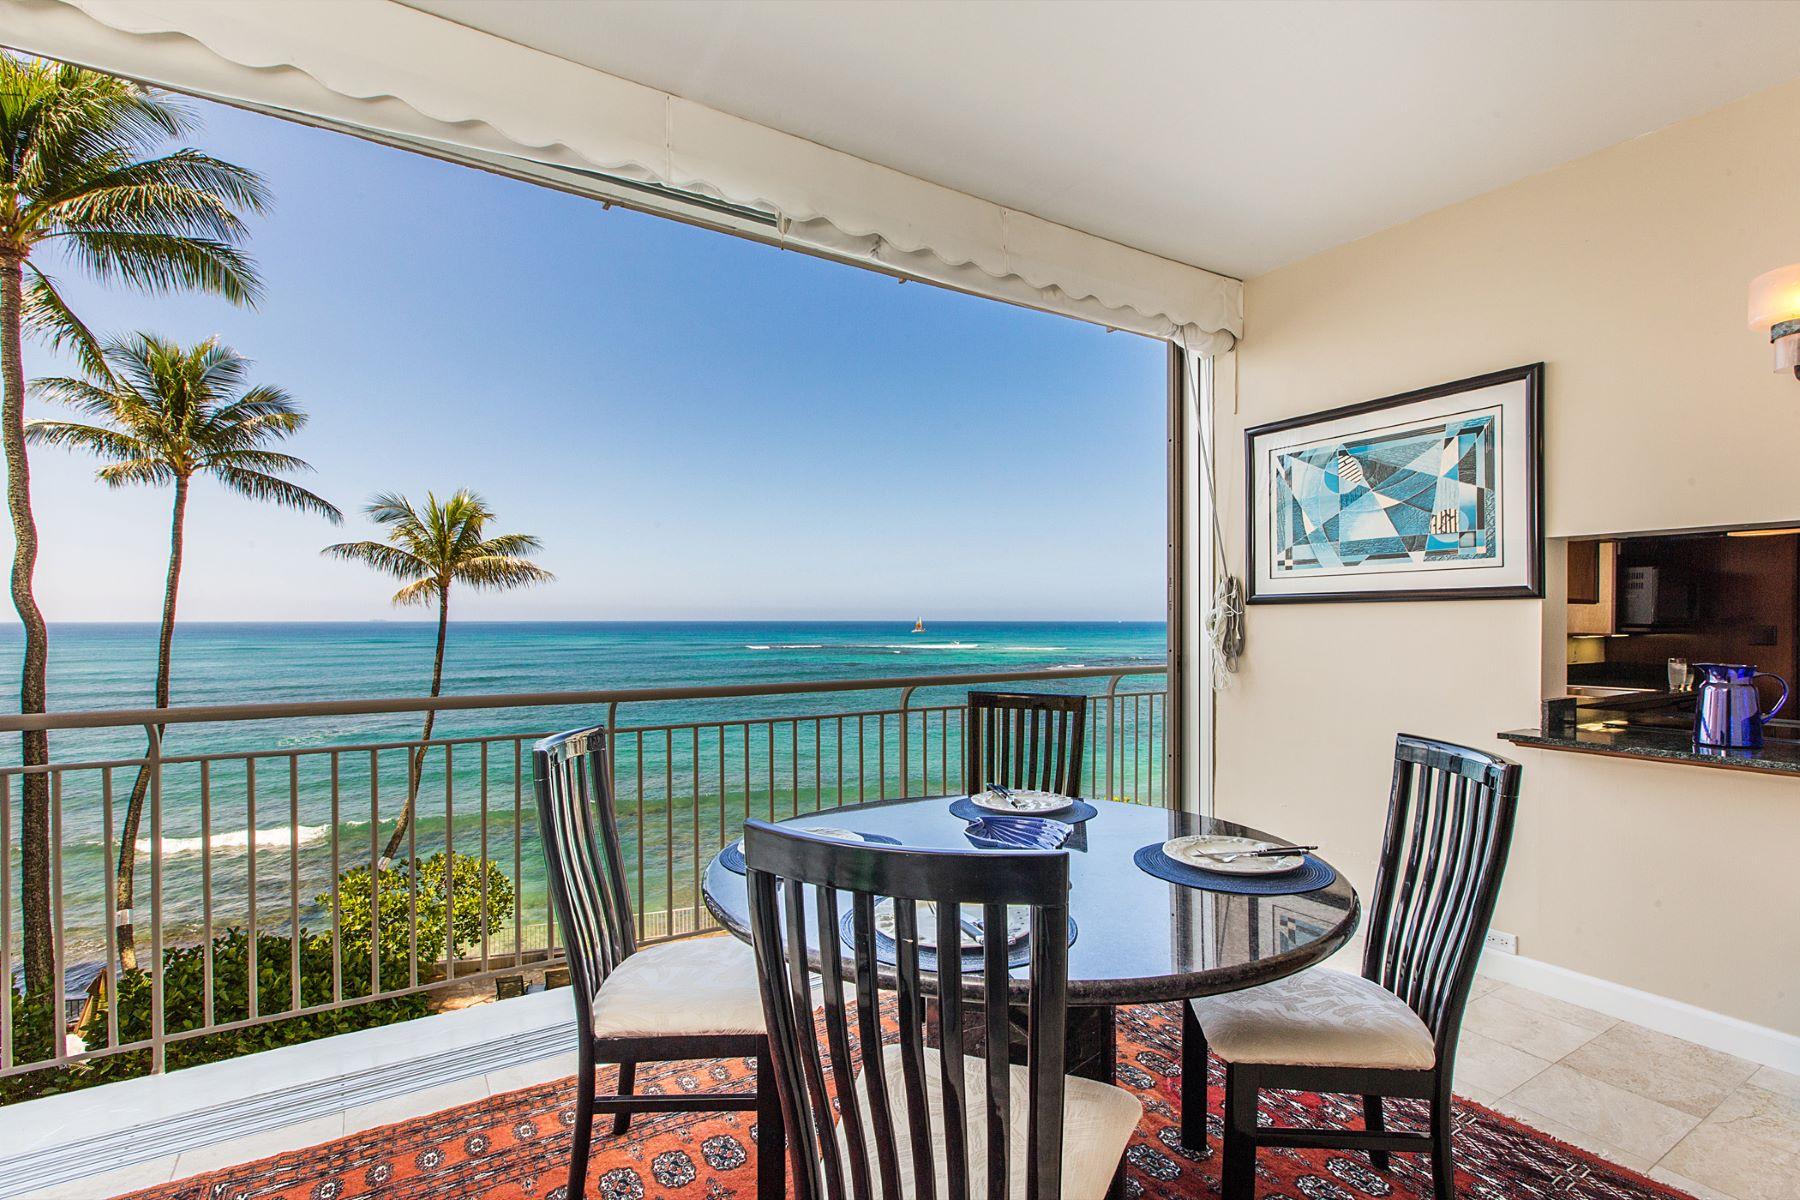 Propiedad en venta Honolulu